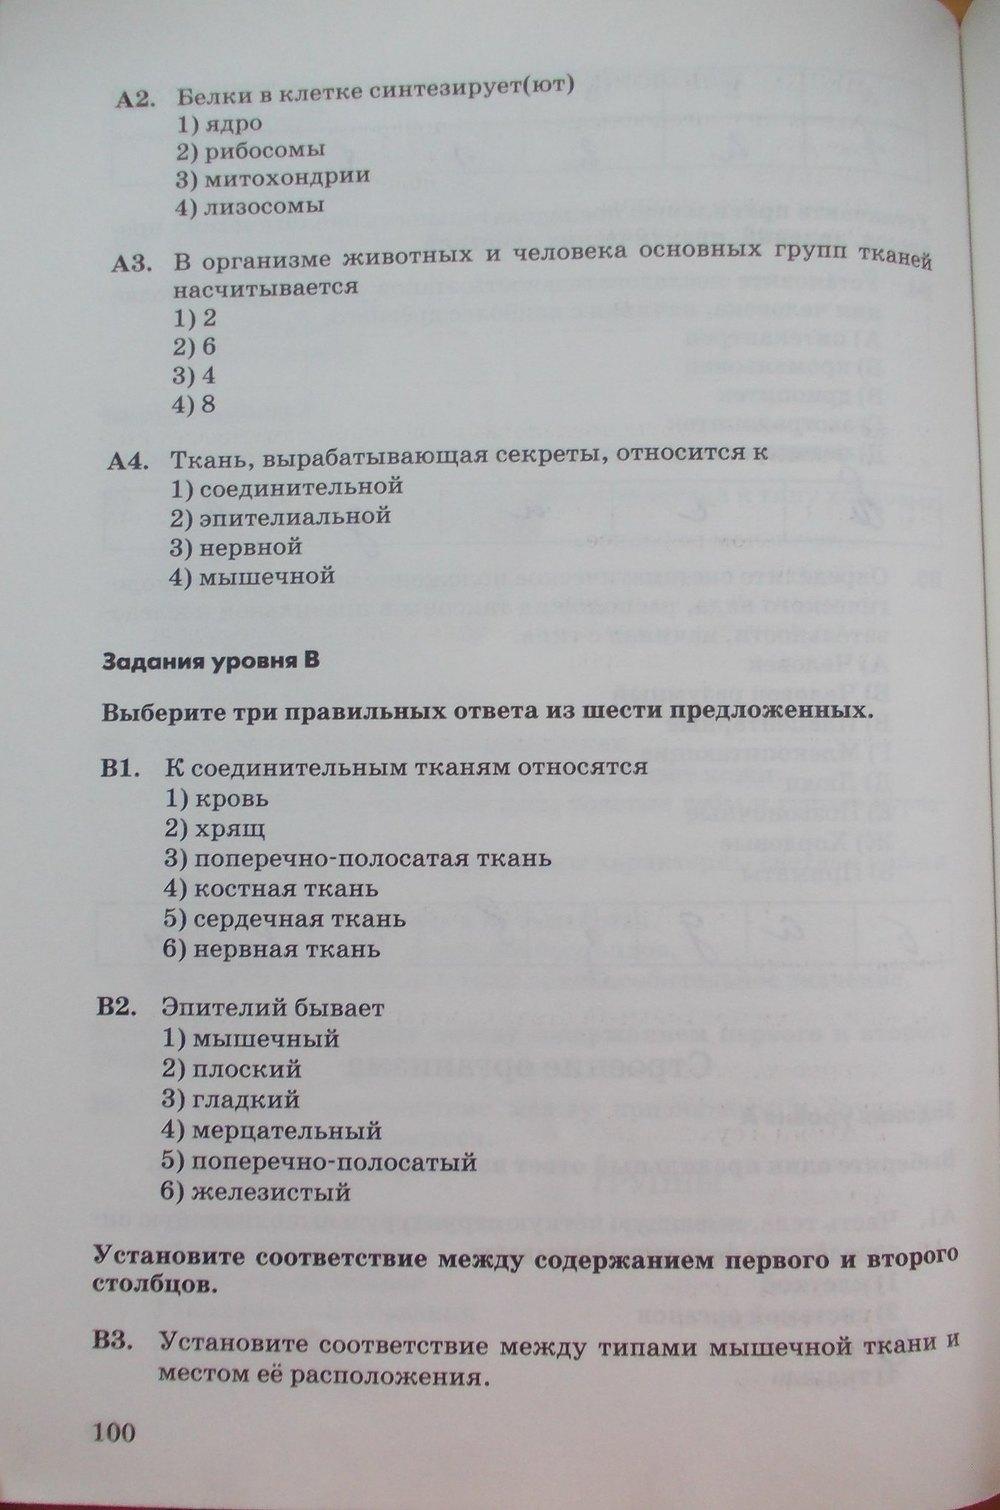 маш д.в колесов биологии р.д 8 беляев по и.н класса гдз